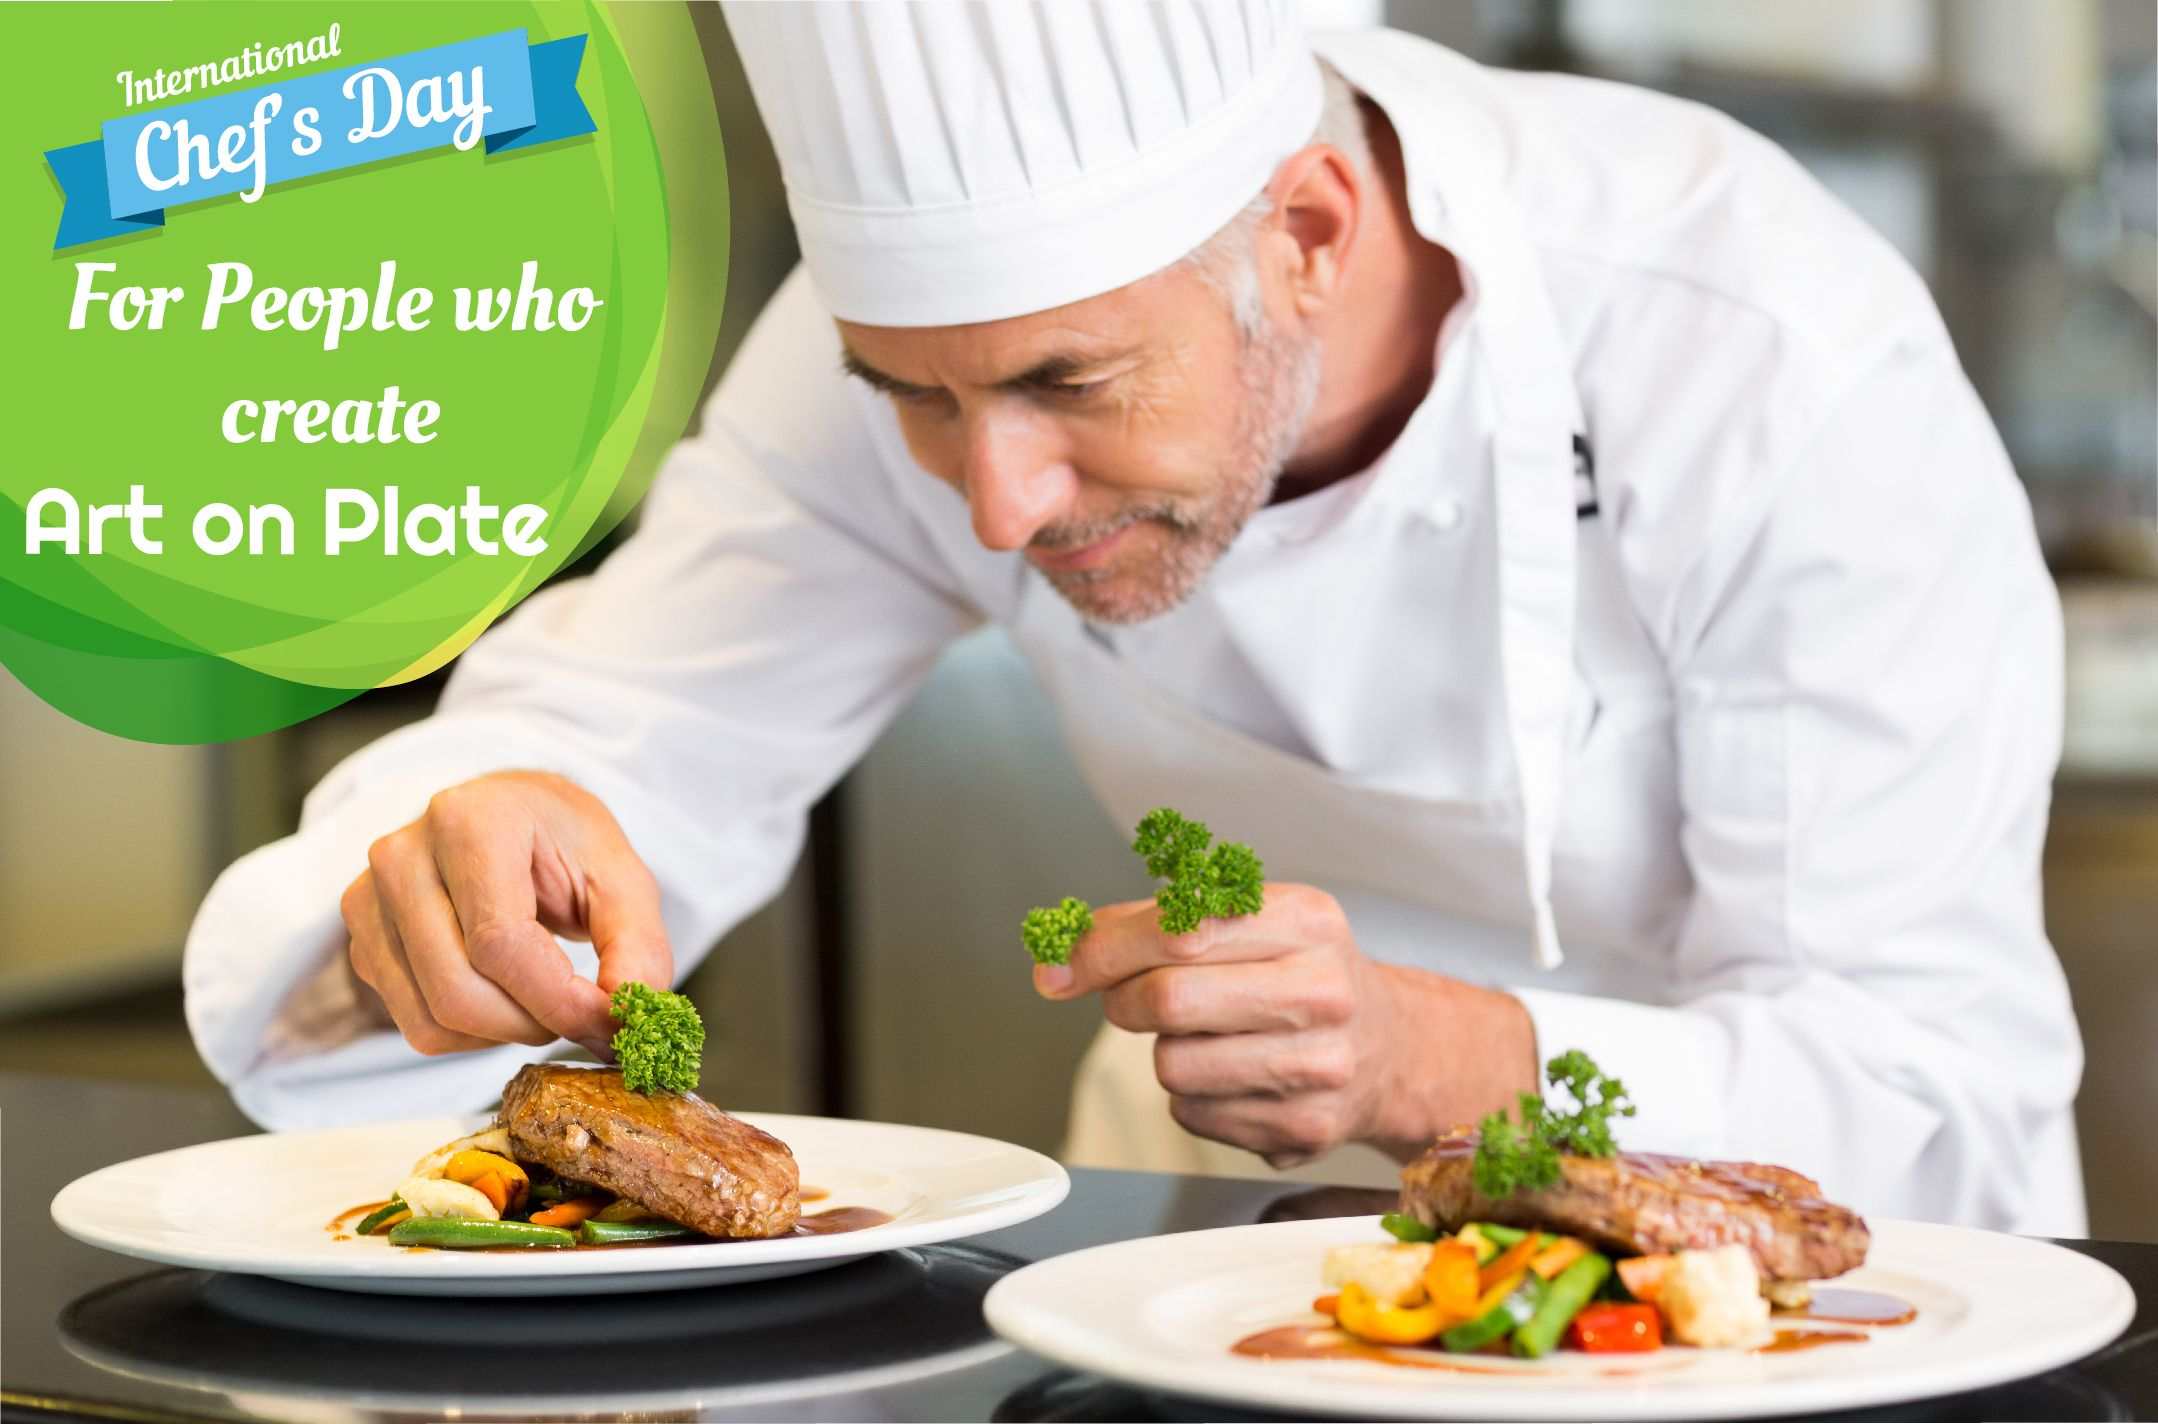 Happy Culinary